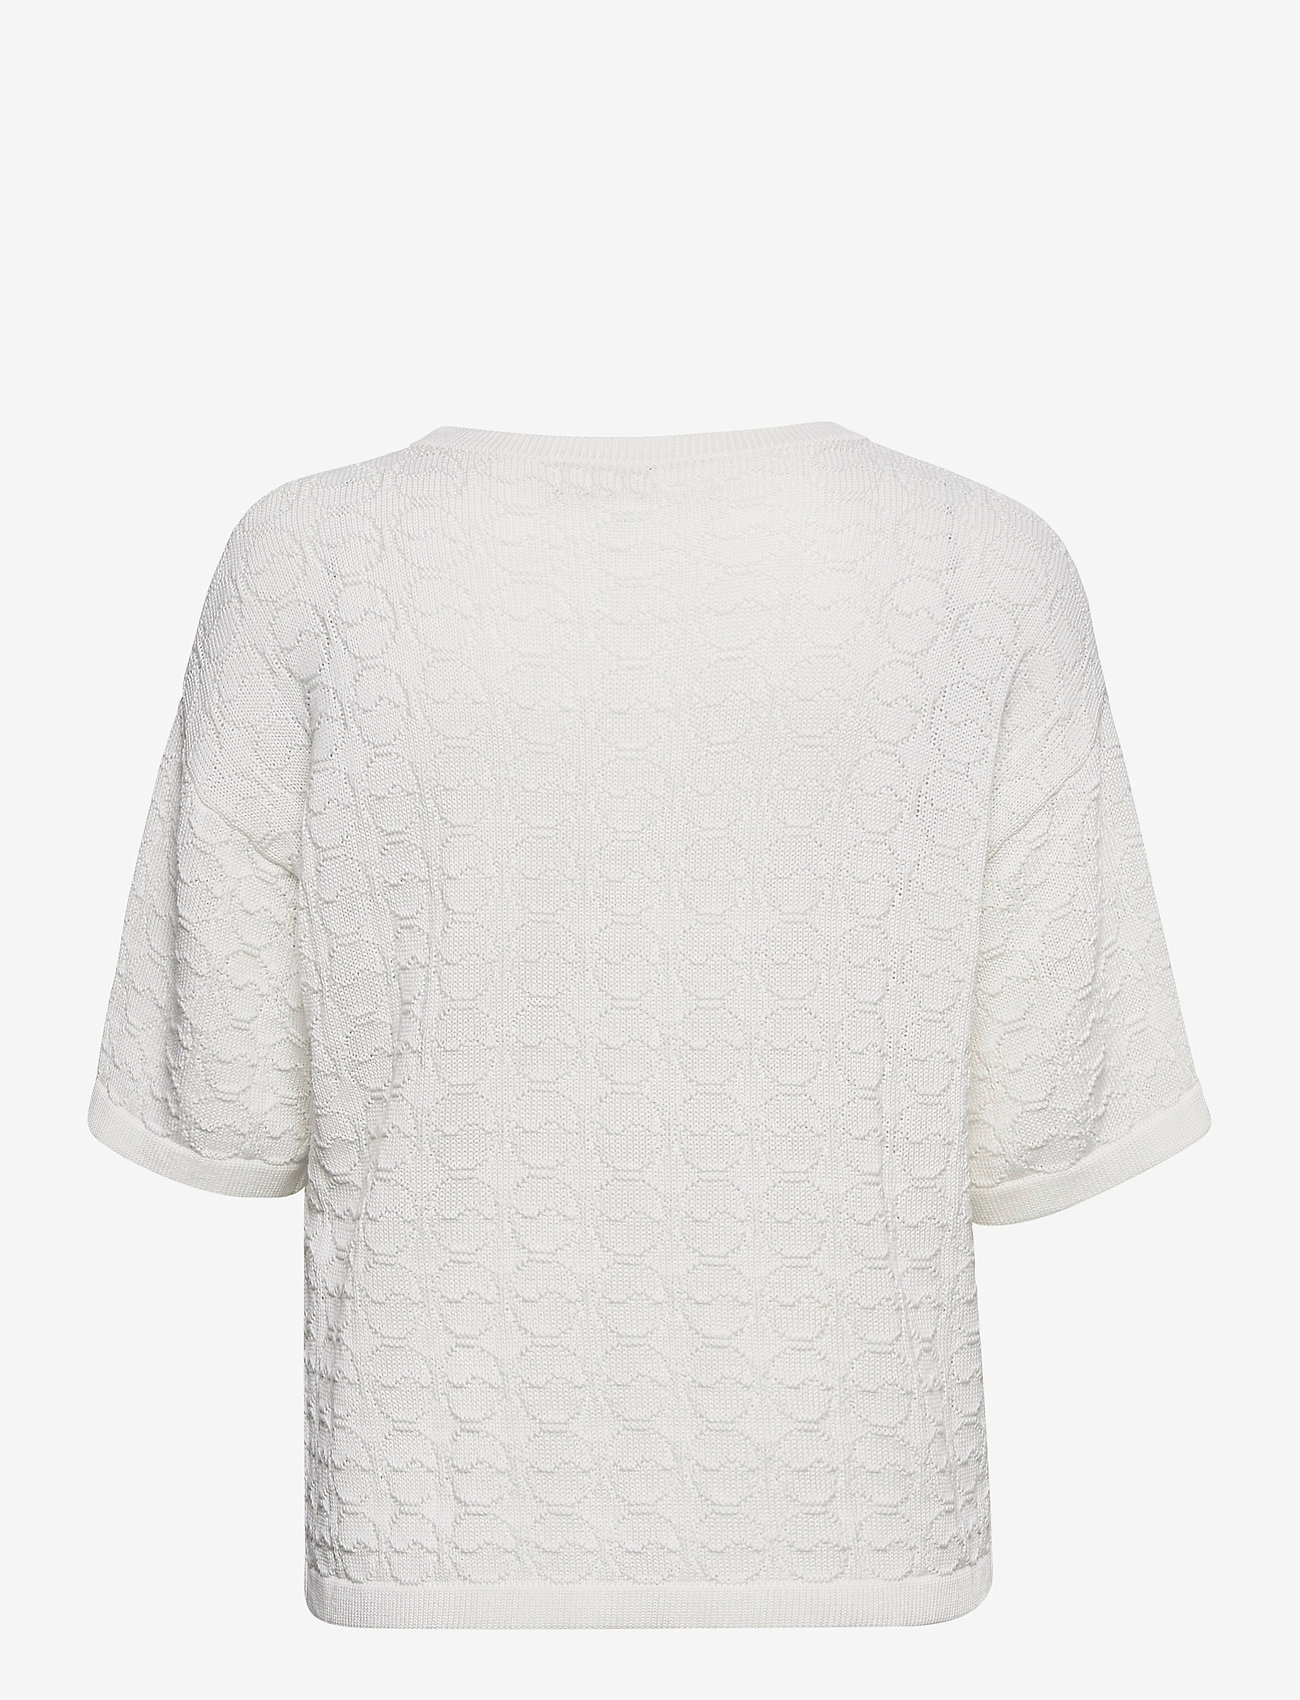 BUSNEL - Christelle top - gebreide t-shirts - white - 1